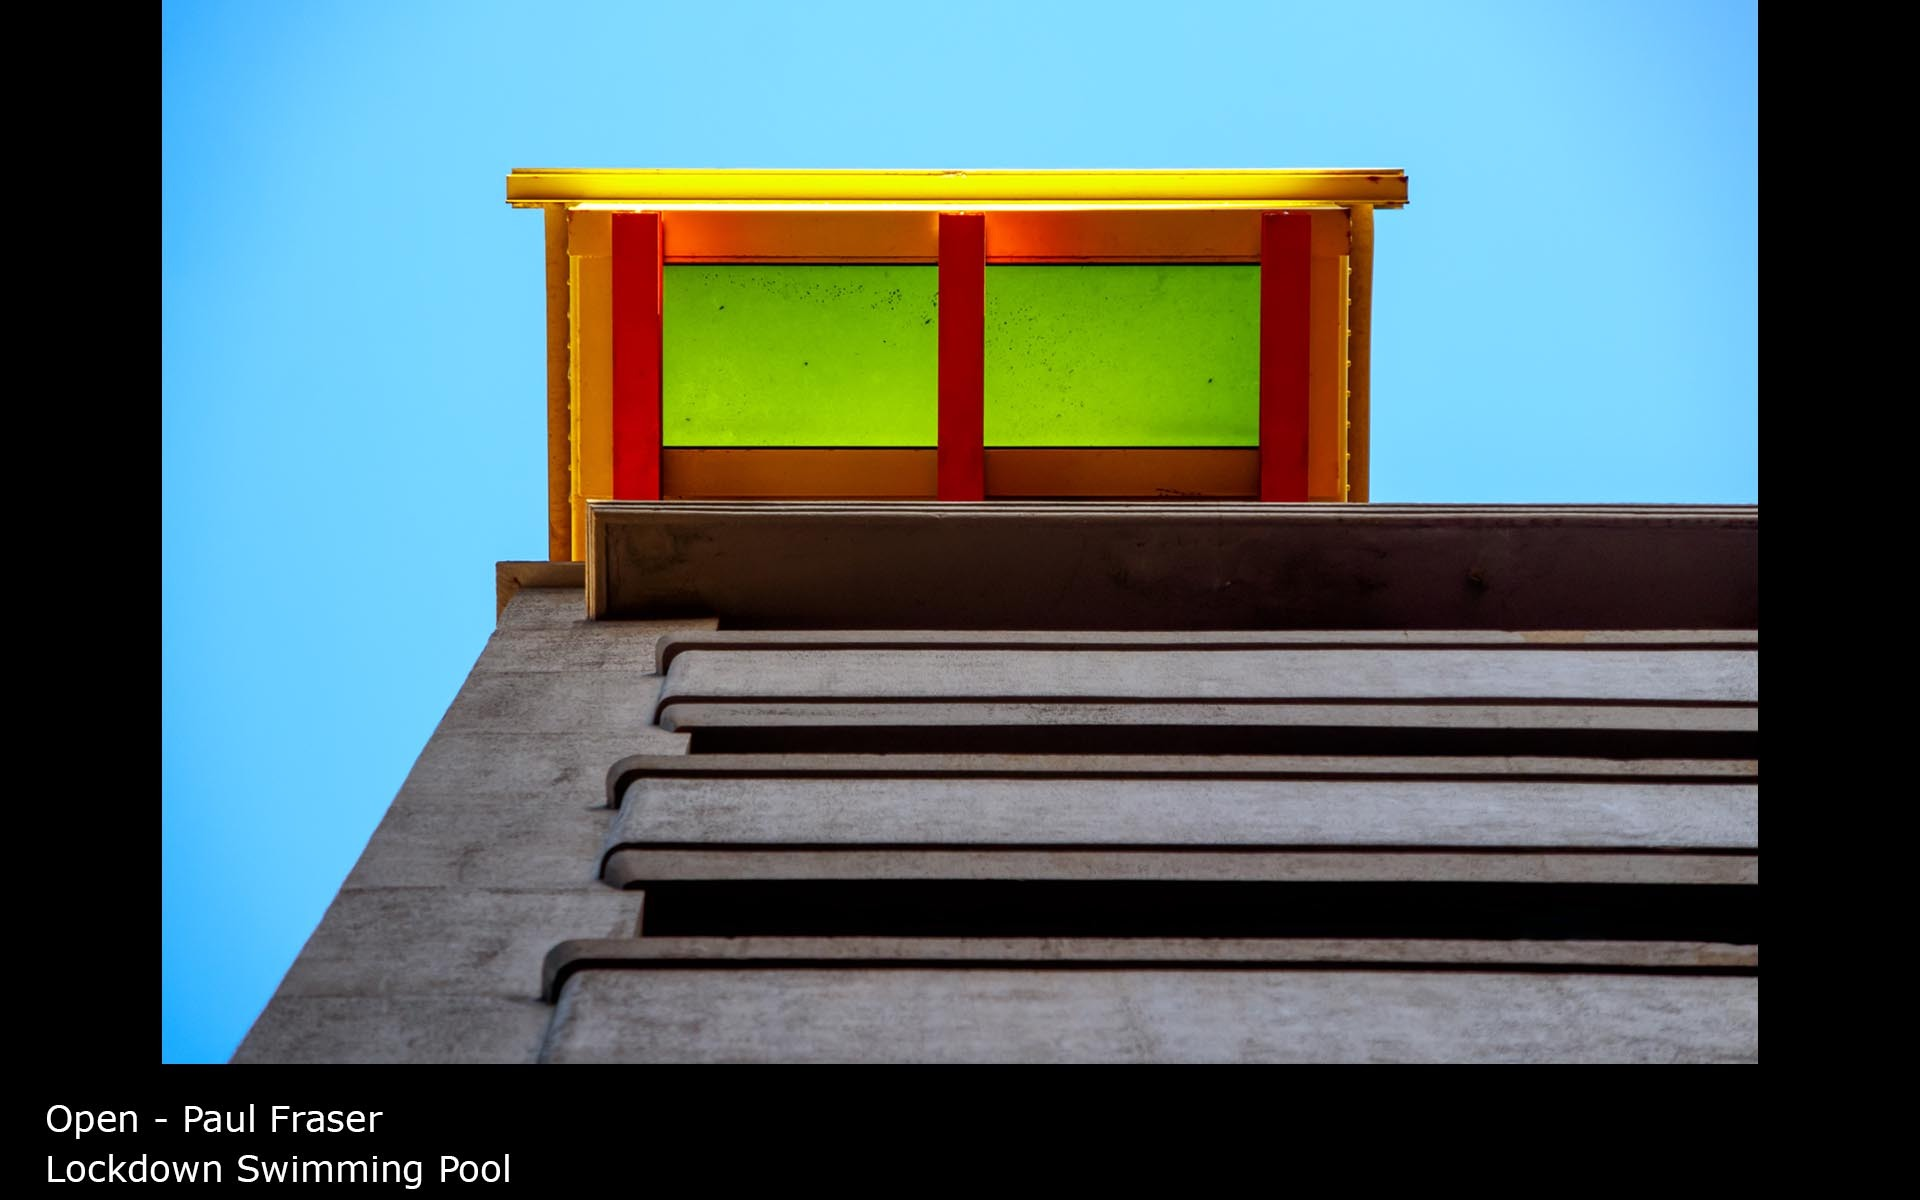 Lockdown Swimming Pool - Paul Fraser